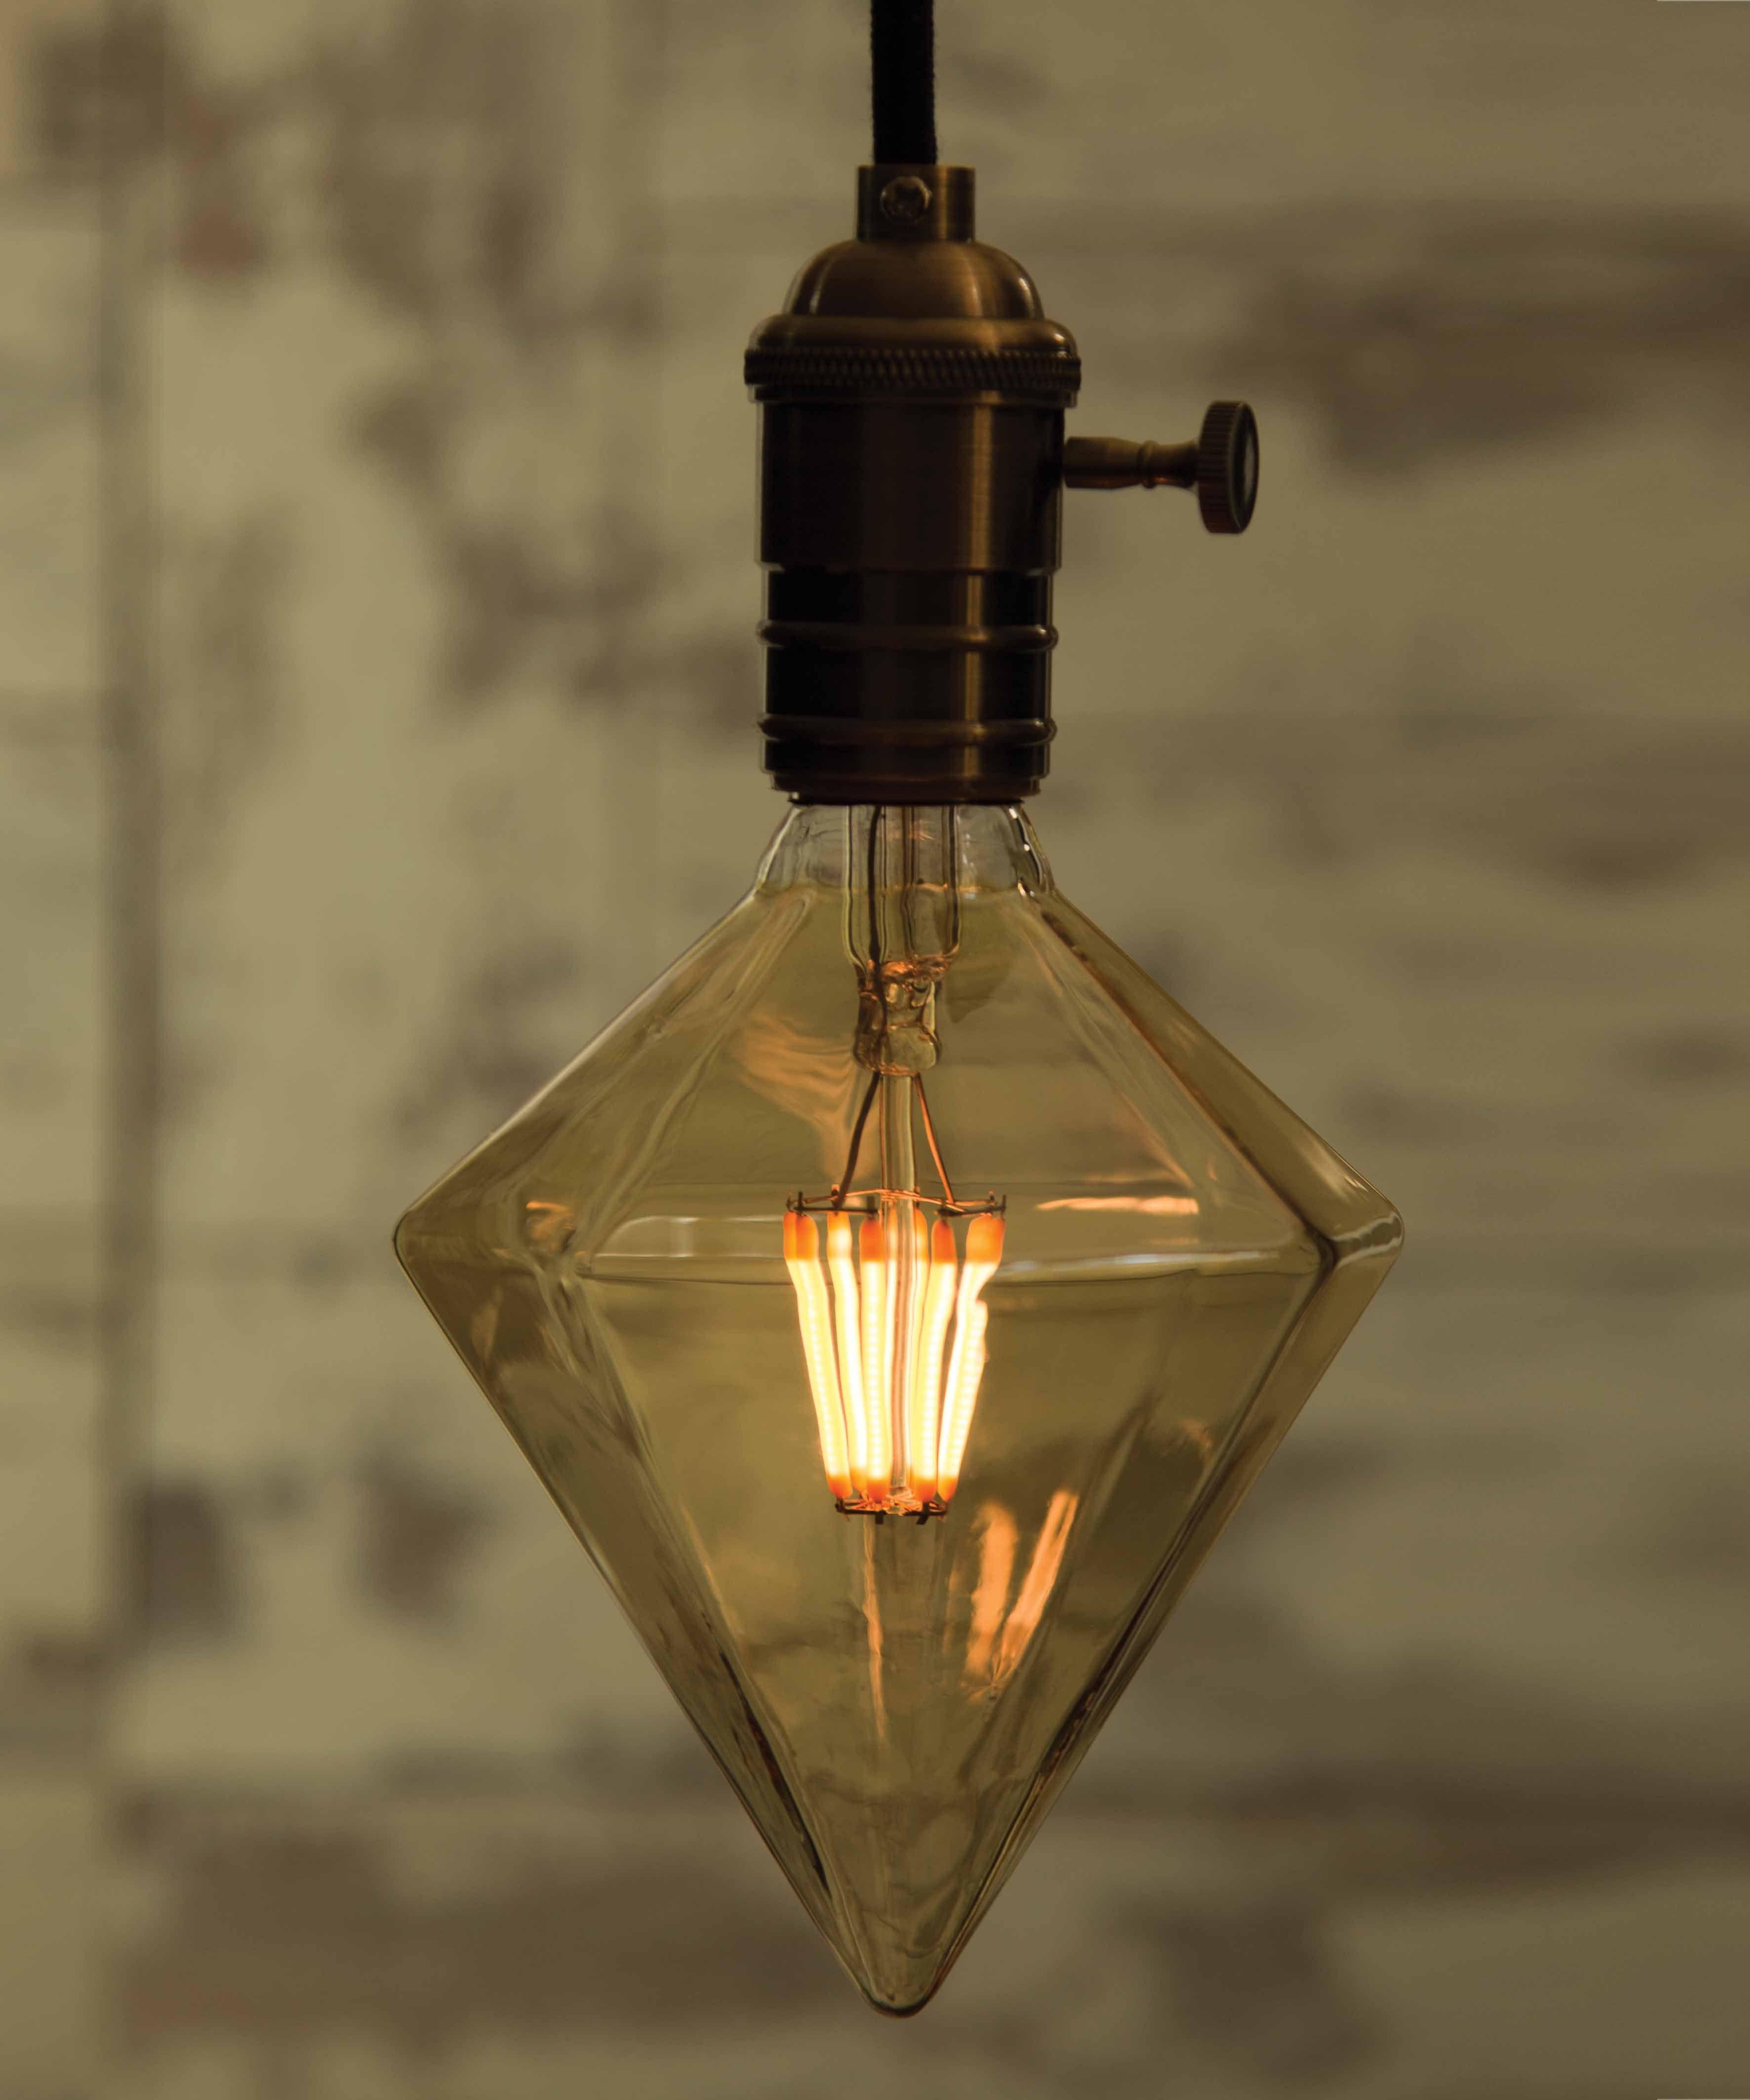 1000 images about lightbulb things on pinterest lightbulbs bulbs - Vintage Light Bulb Led Sharp Diamond 8 Filaments Led William Watson